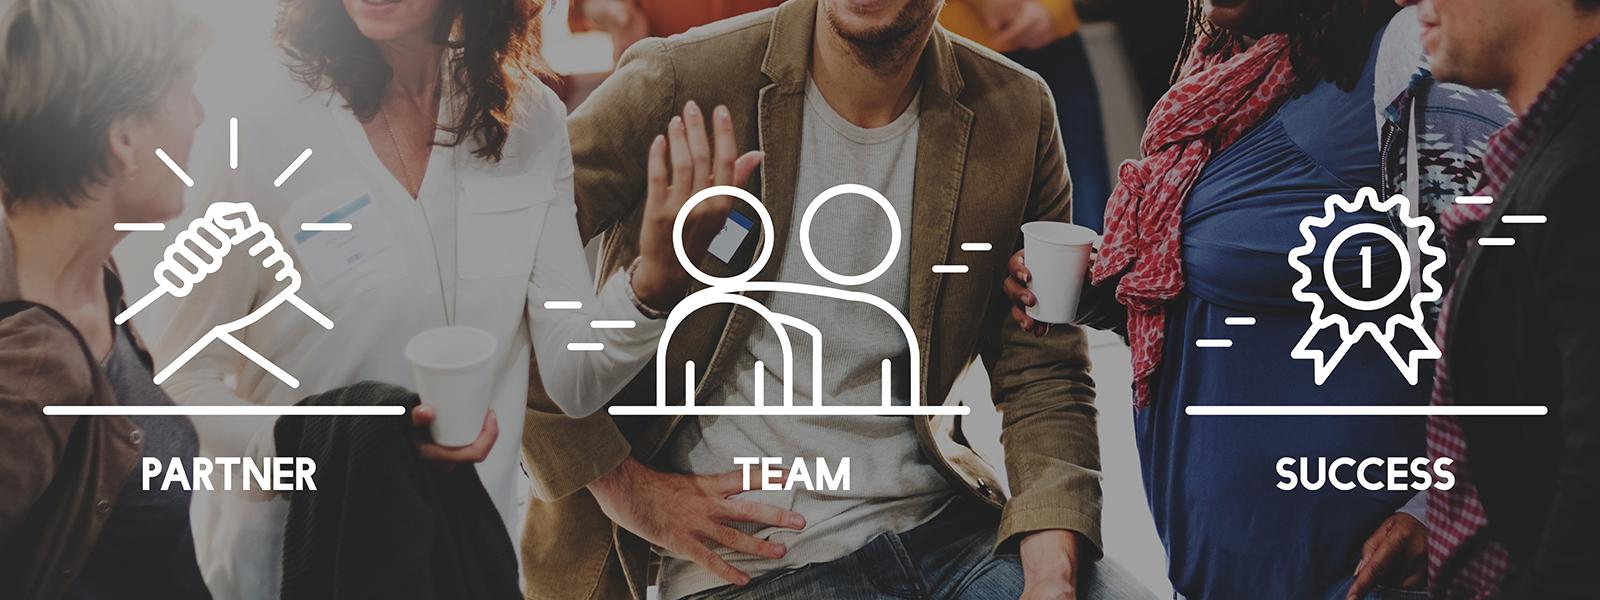 Partner team success icons